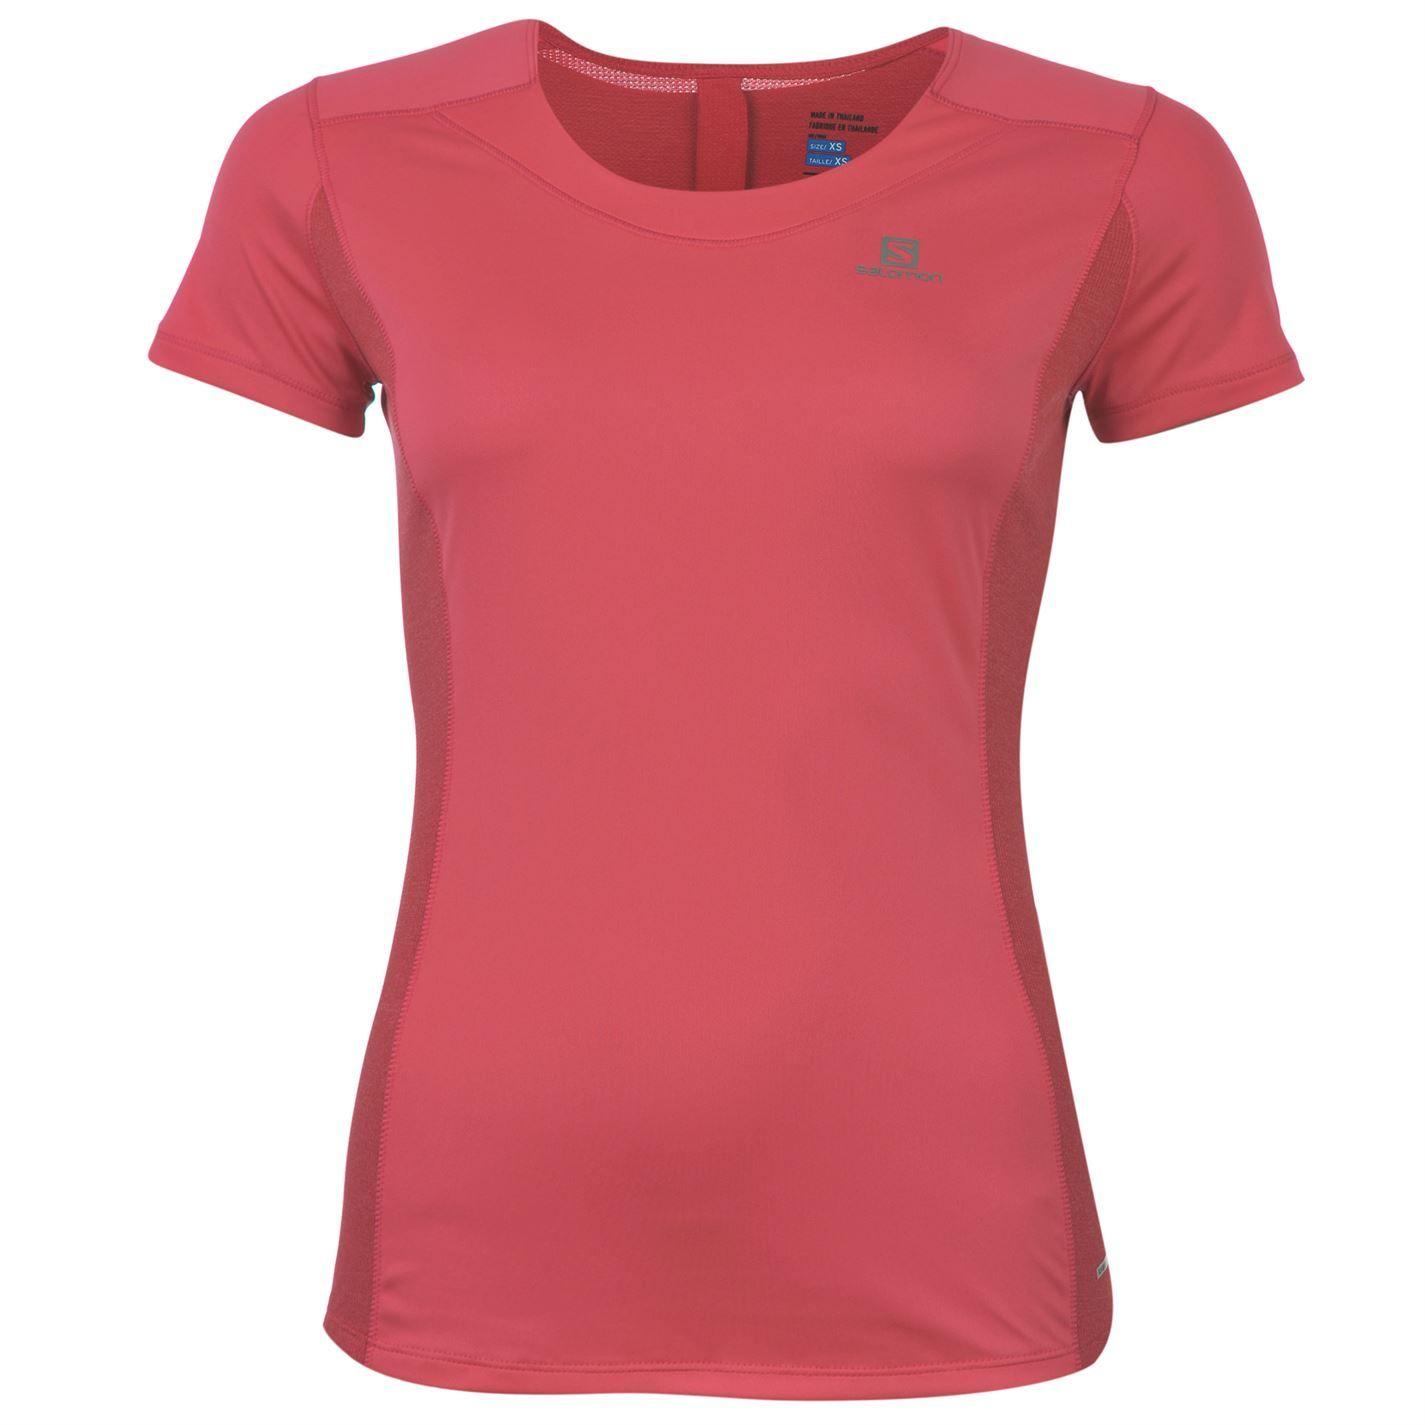 Salomon | Salomon Agile Short Sleeve T Shirt Ladies | Ladies Running Clothing